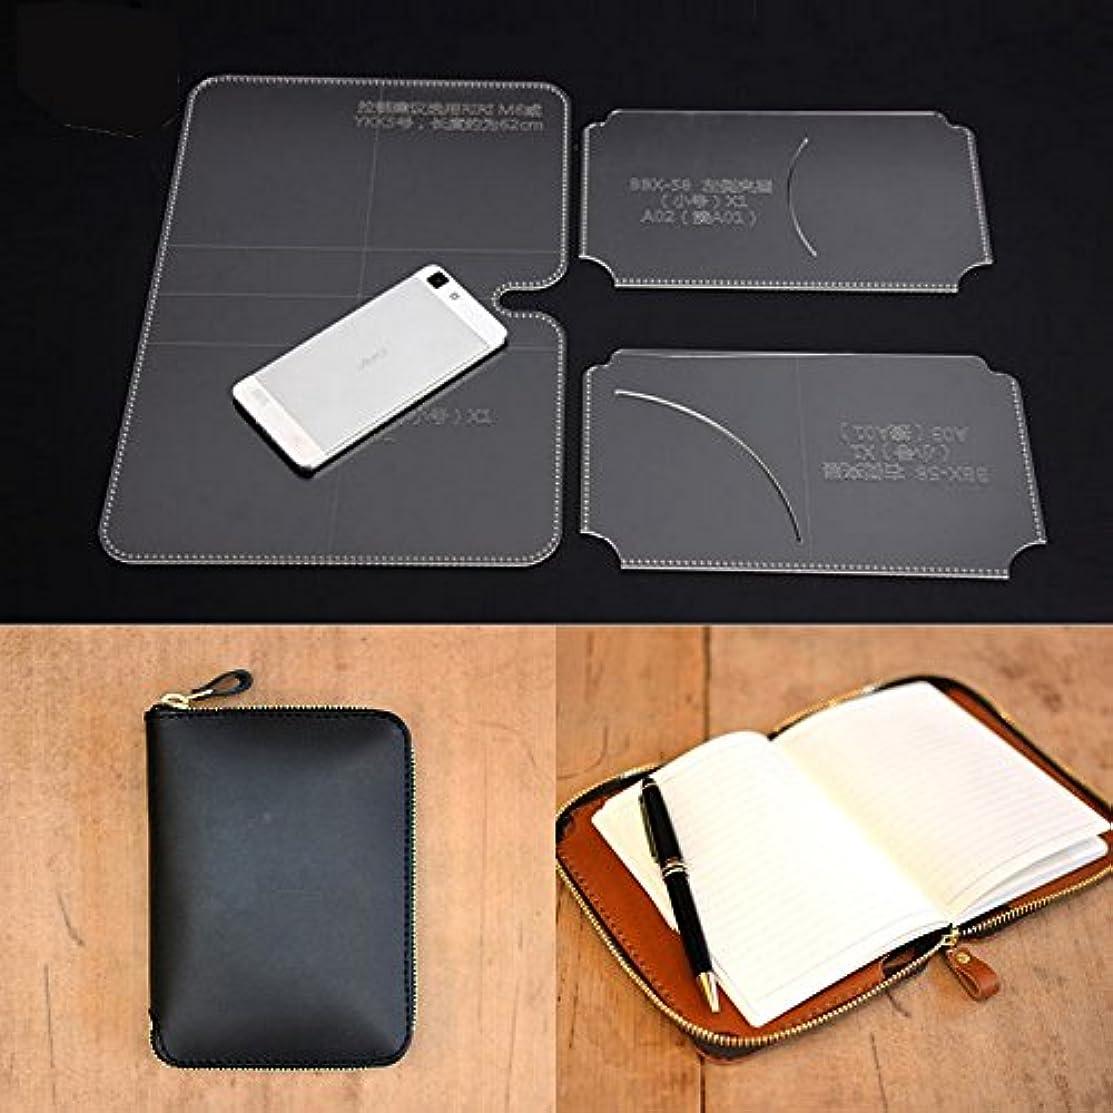 NW Handbag Acrylic Template Wallet Leather Pattern Acrylic Leather Pattern Leather Templates for Bags